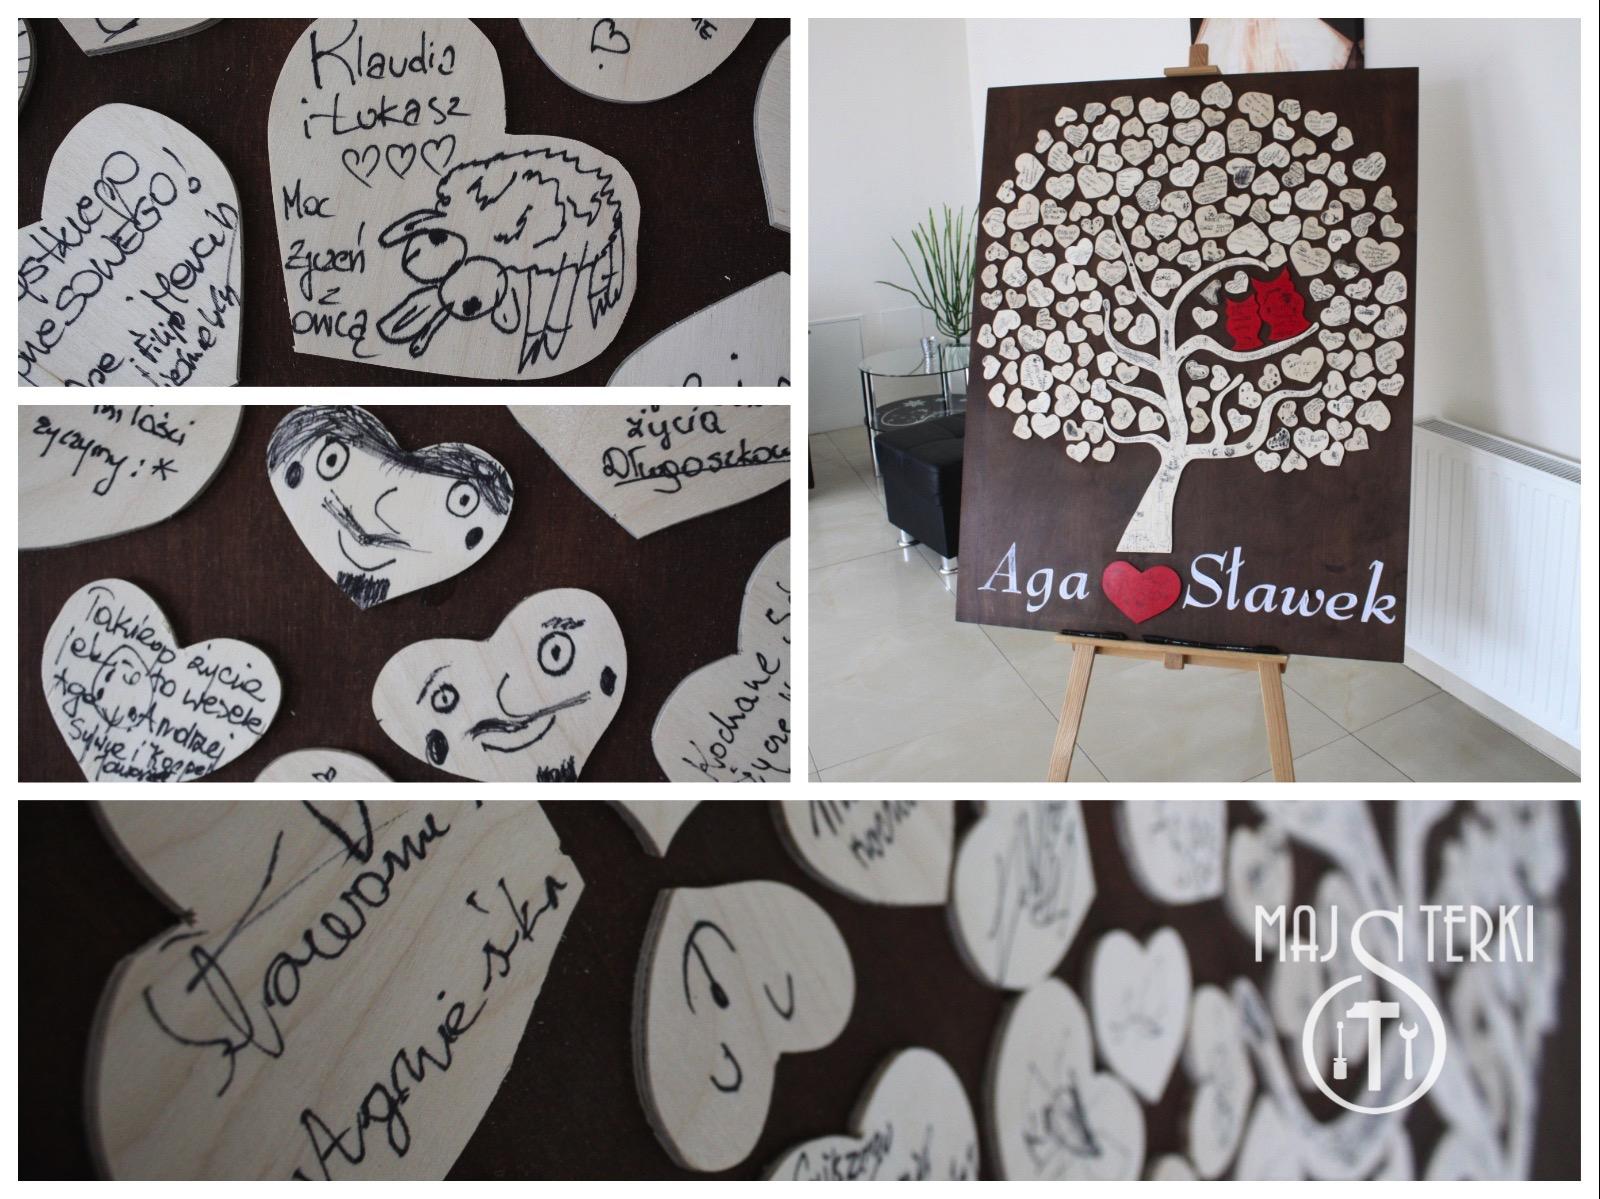 drzewko-serca-wesele-majsterki6